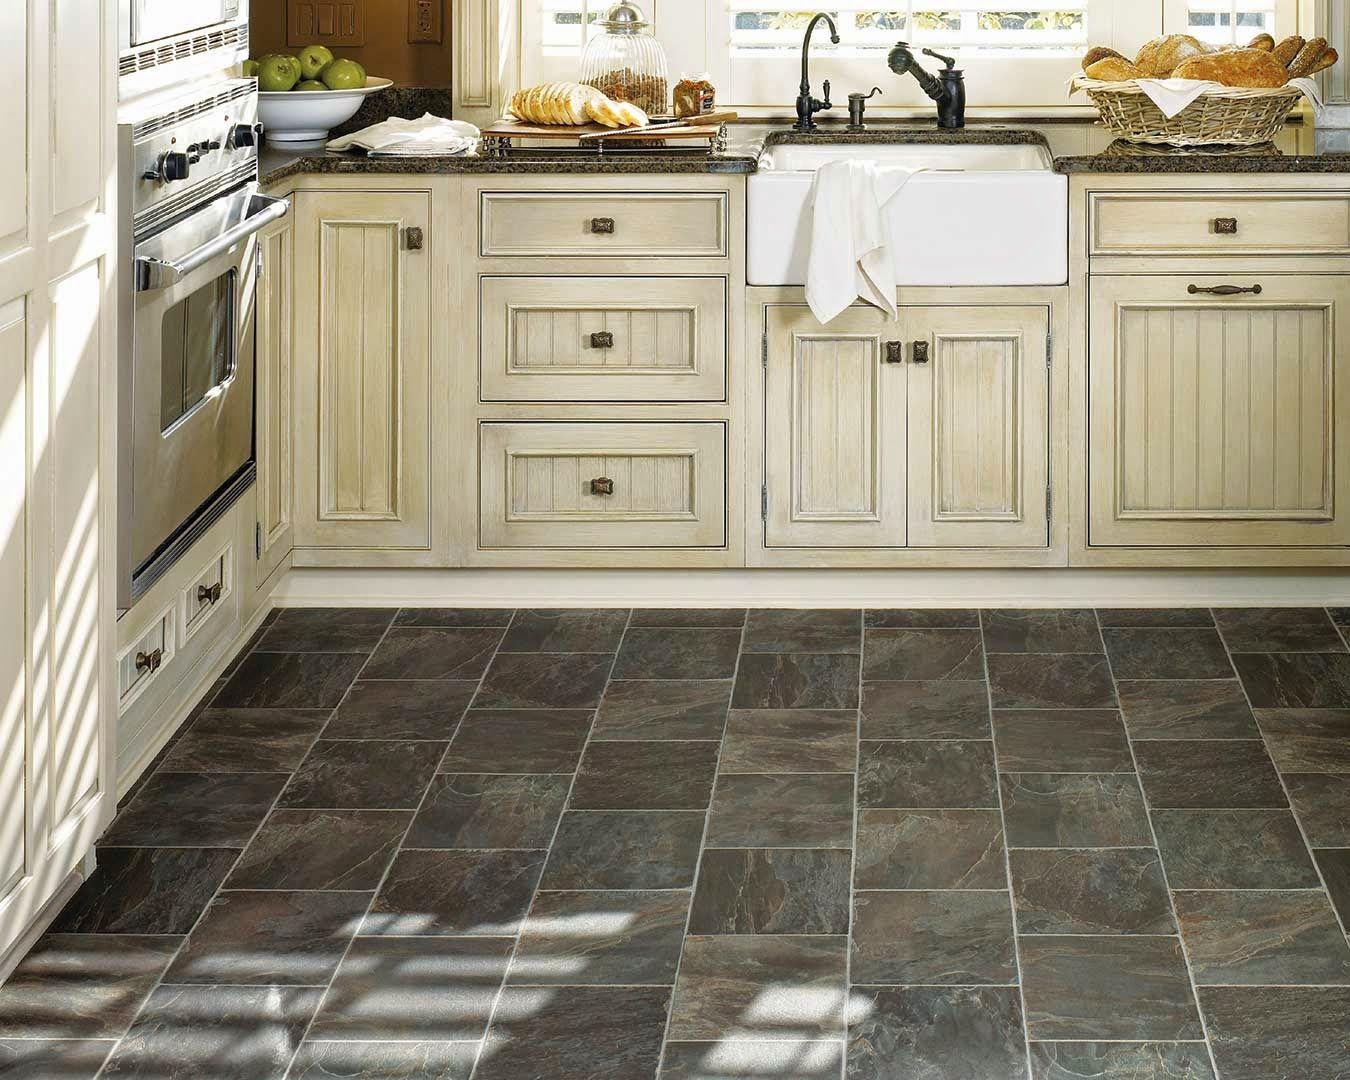 vinyl kitchen flooring pickled oak cabinets dark floors Best Black Vinyl Sheet Flooring For Small Kitchen With Old